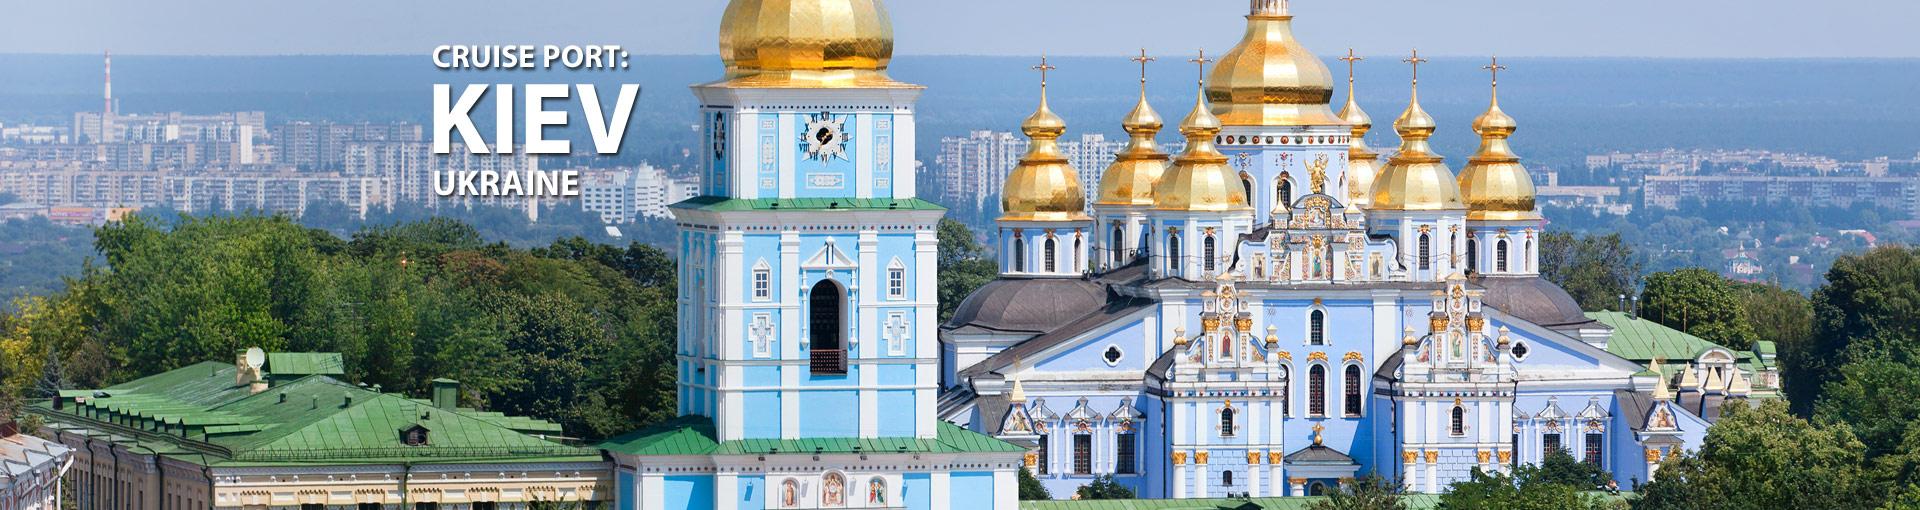 Cruises from Kiev, Ukraine